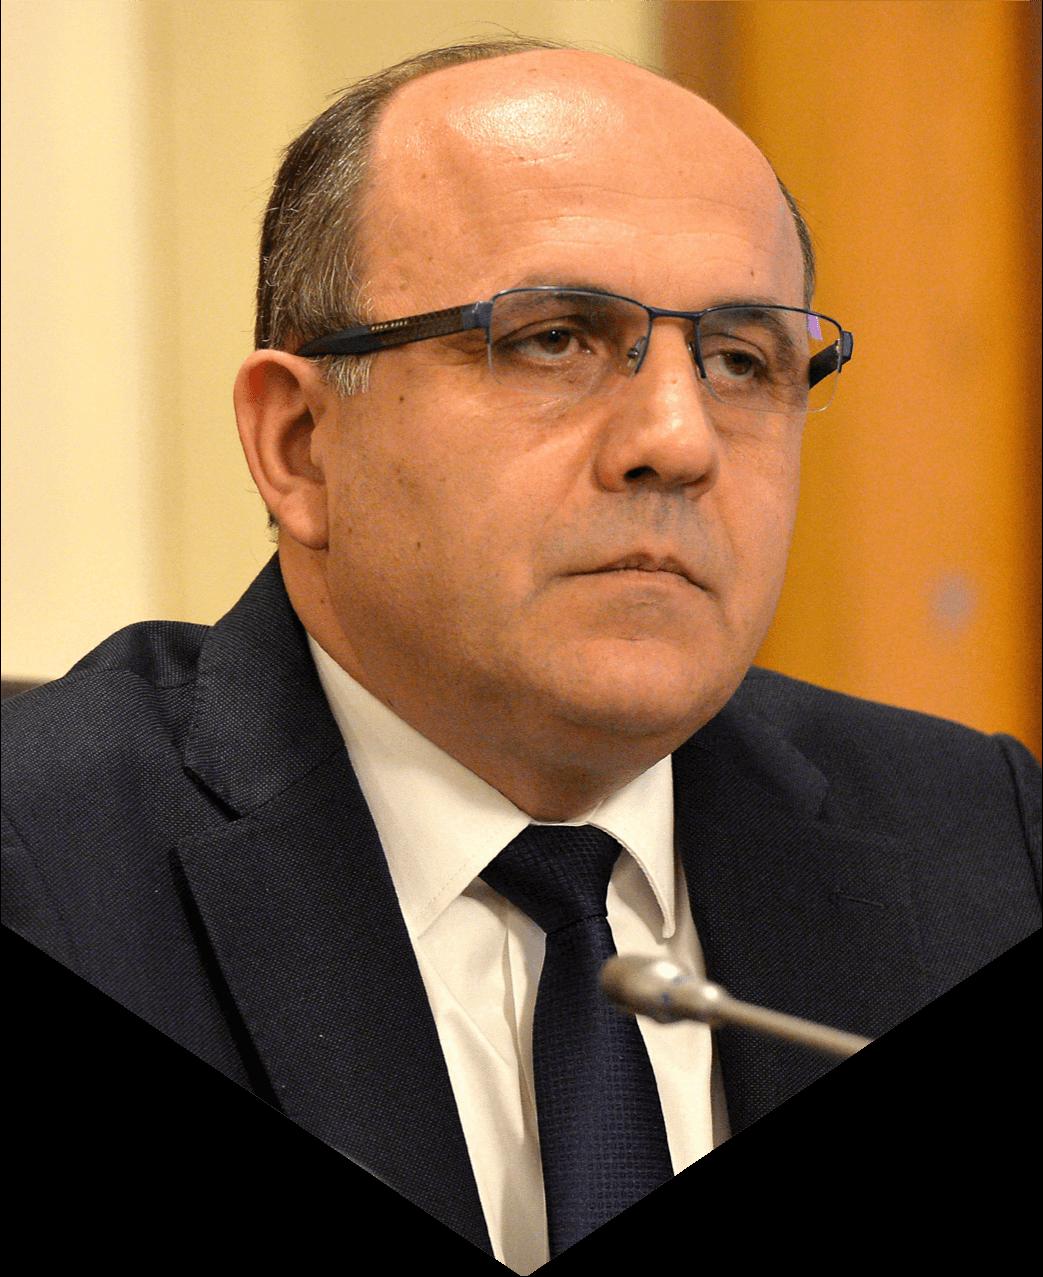 Ionel Sorin Balan